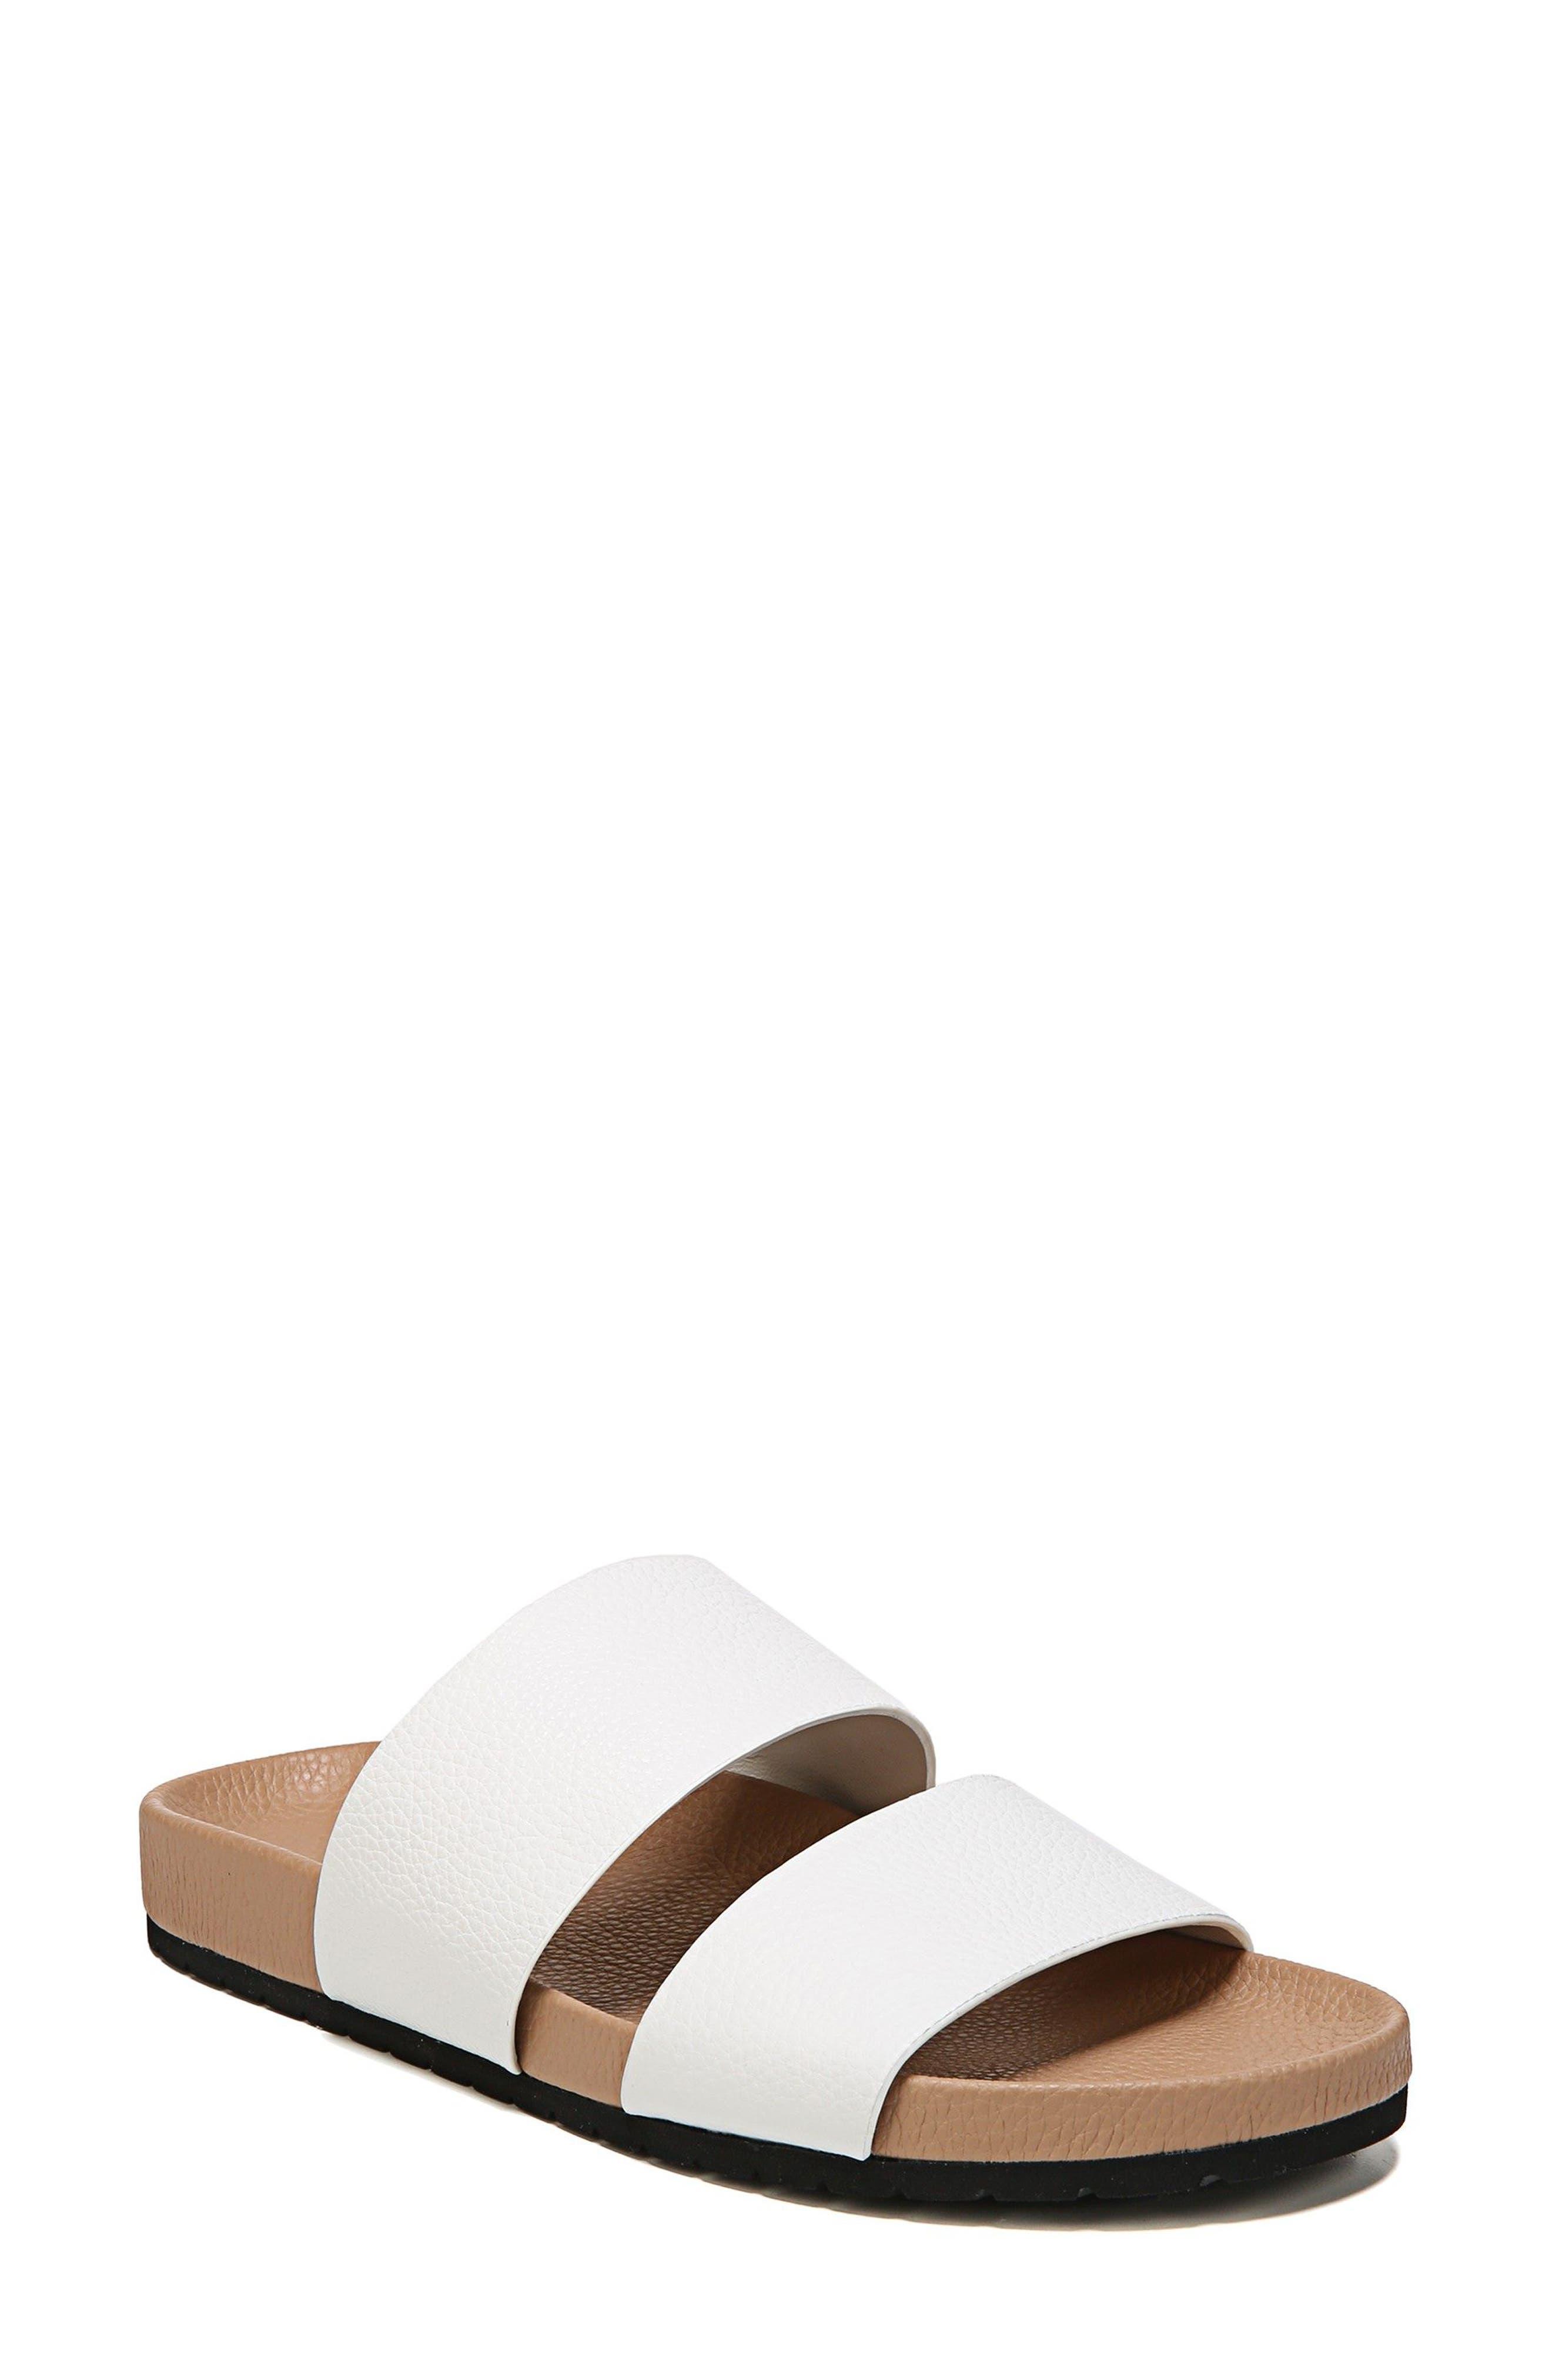 Georgie Slide Sandal,                         Main,                         color, 101